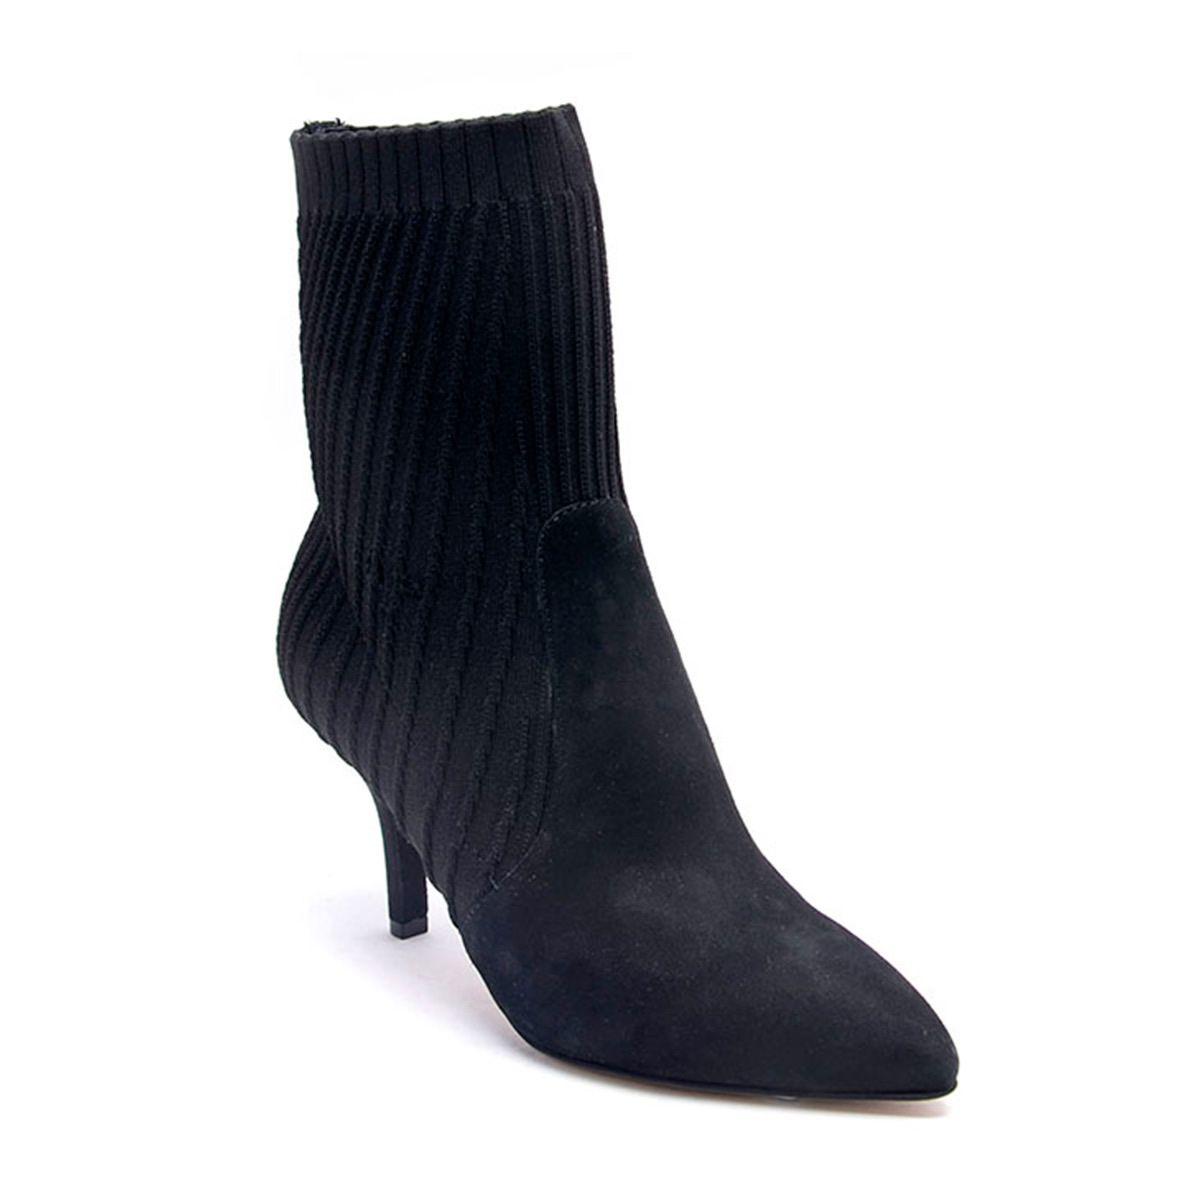 84b969e4e55973 Marc Fisher Shoes - Macy s